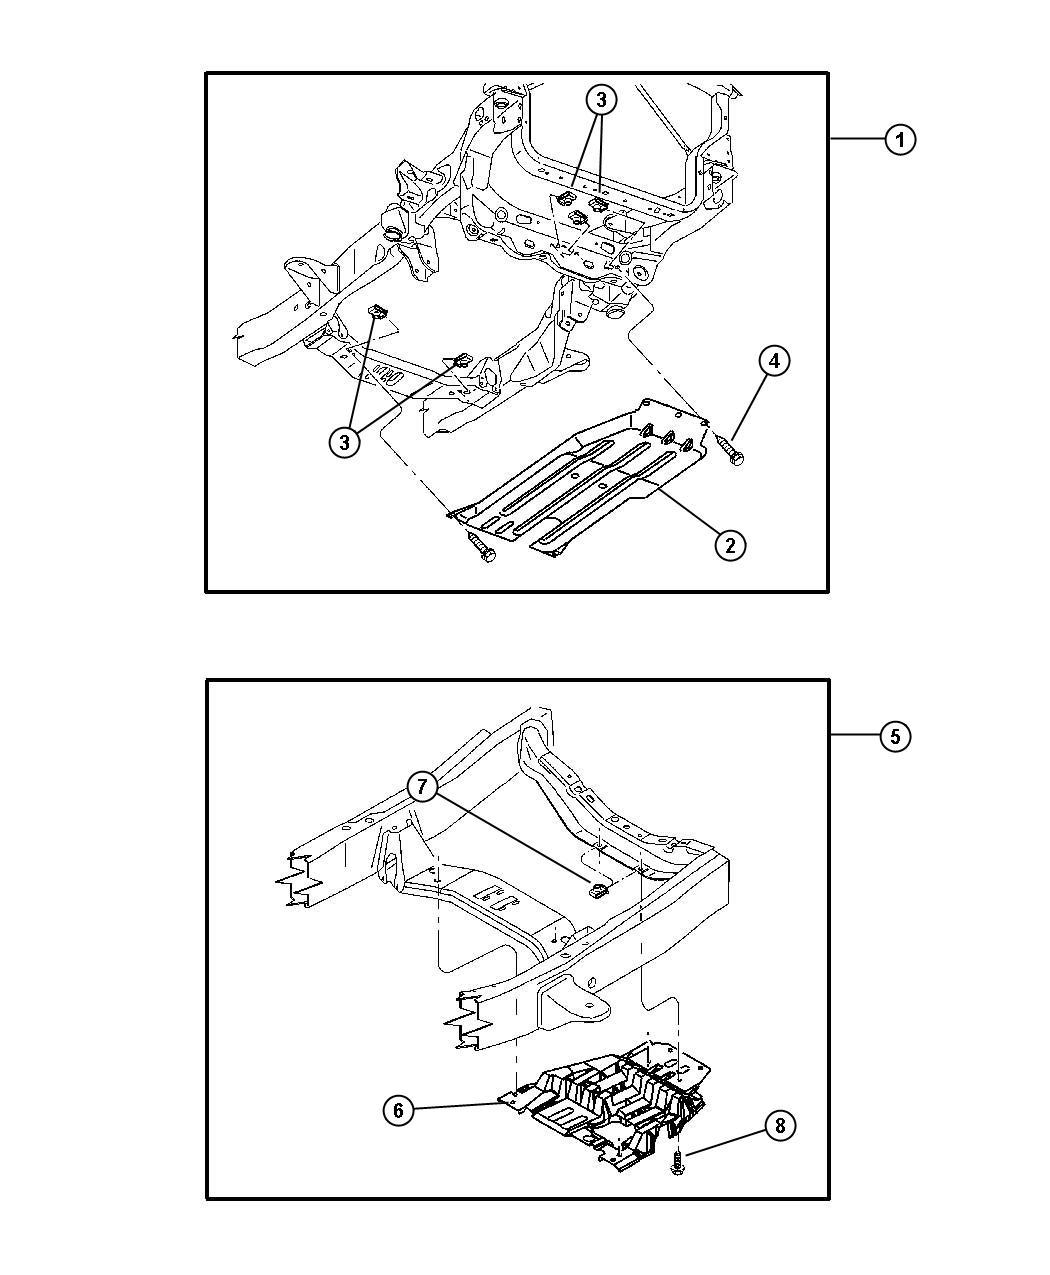 2000 Dodge Durango Parts And Accessories